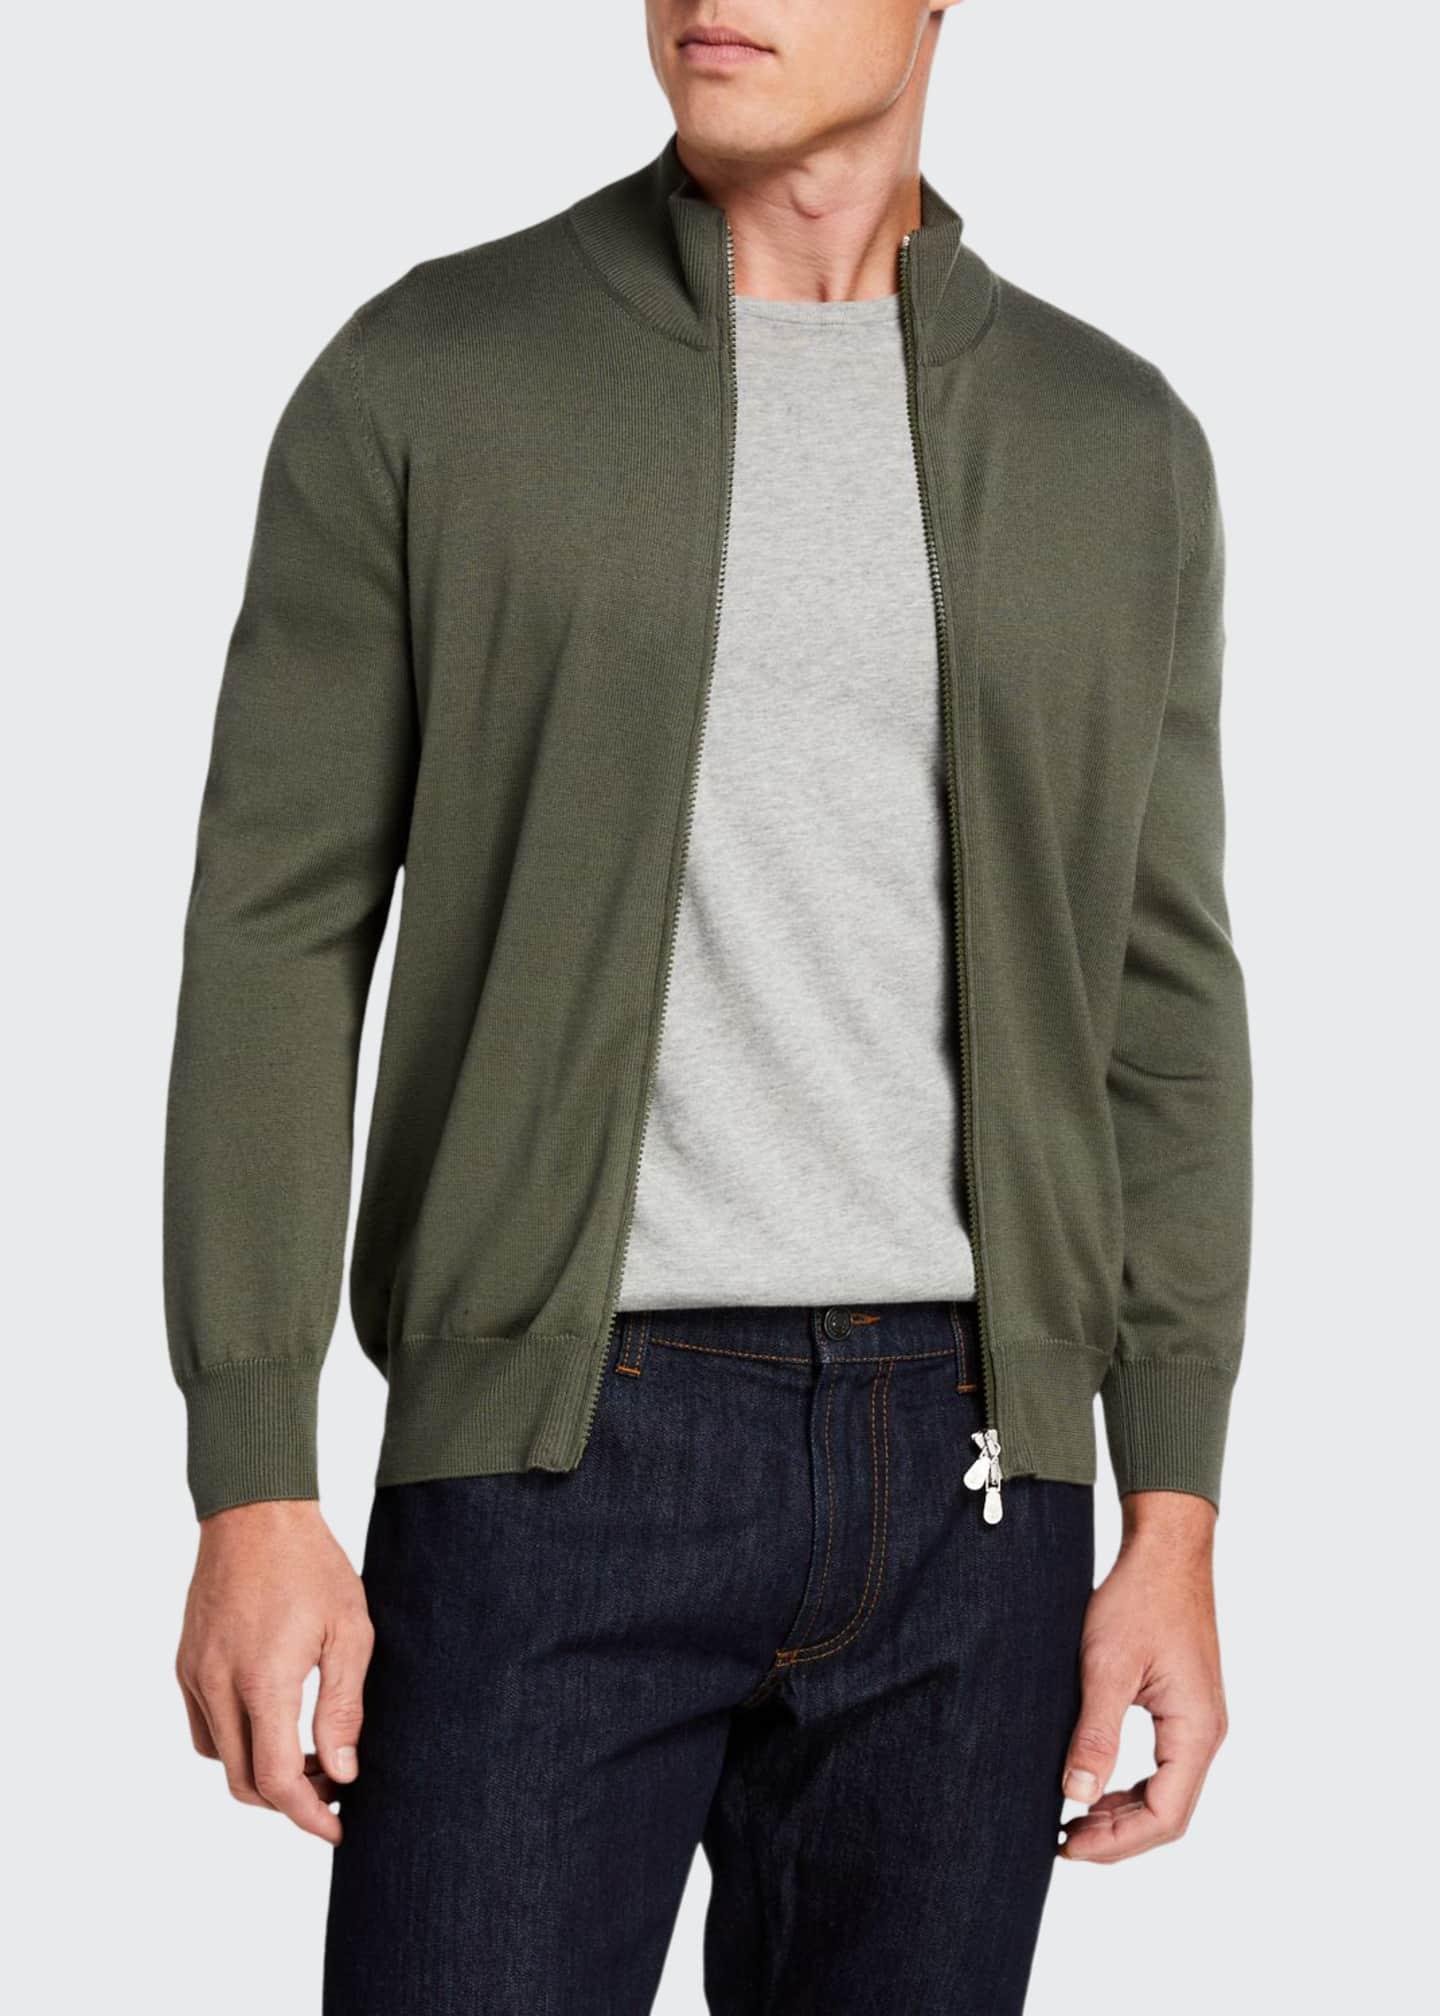 Brunello Cucinelli Men's Wool/Cashmere Zip Front Sweater